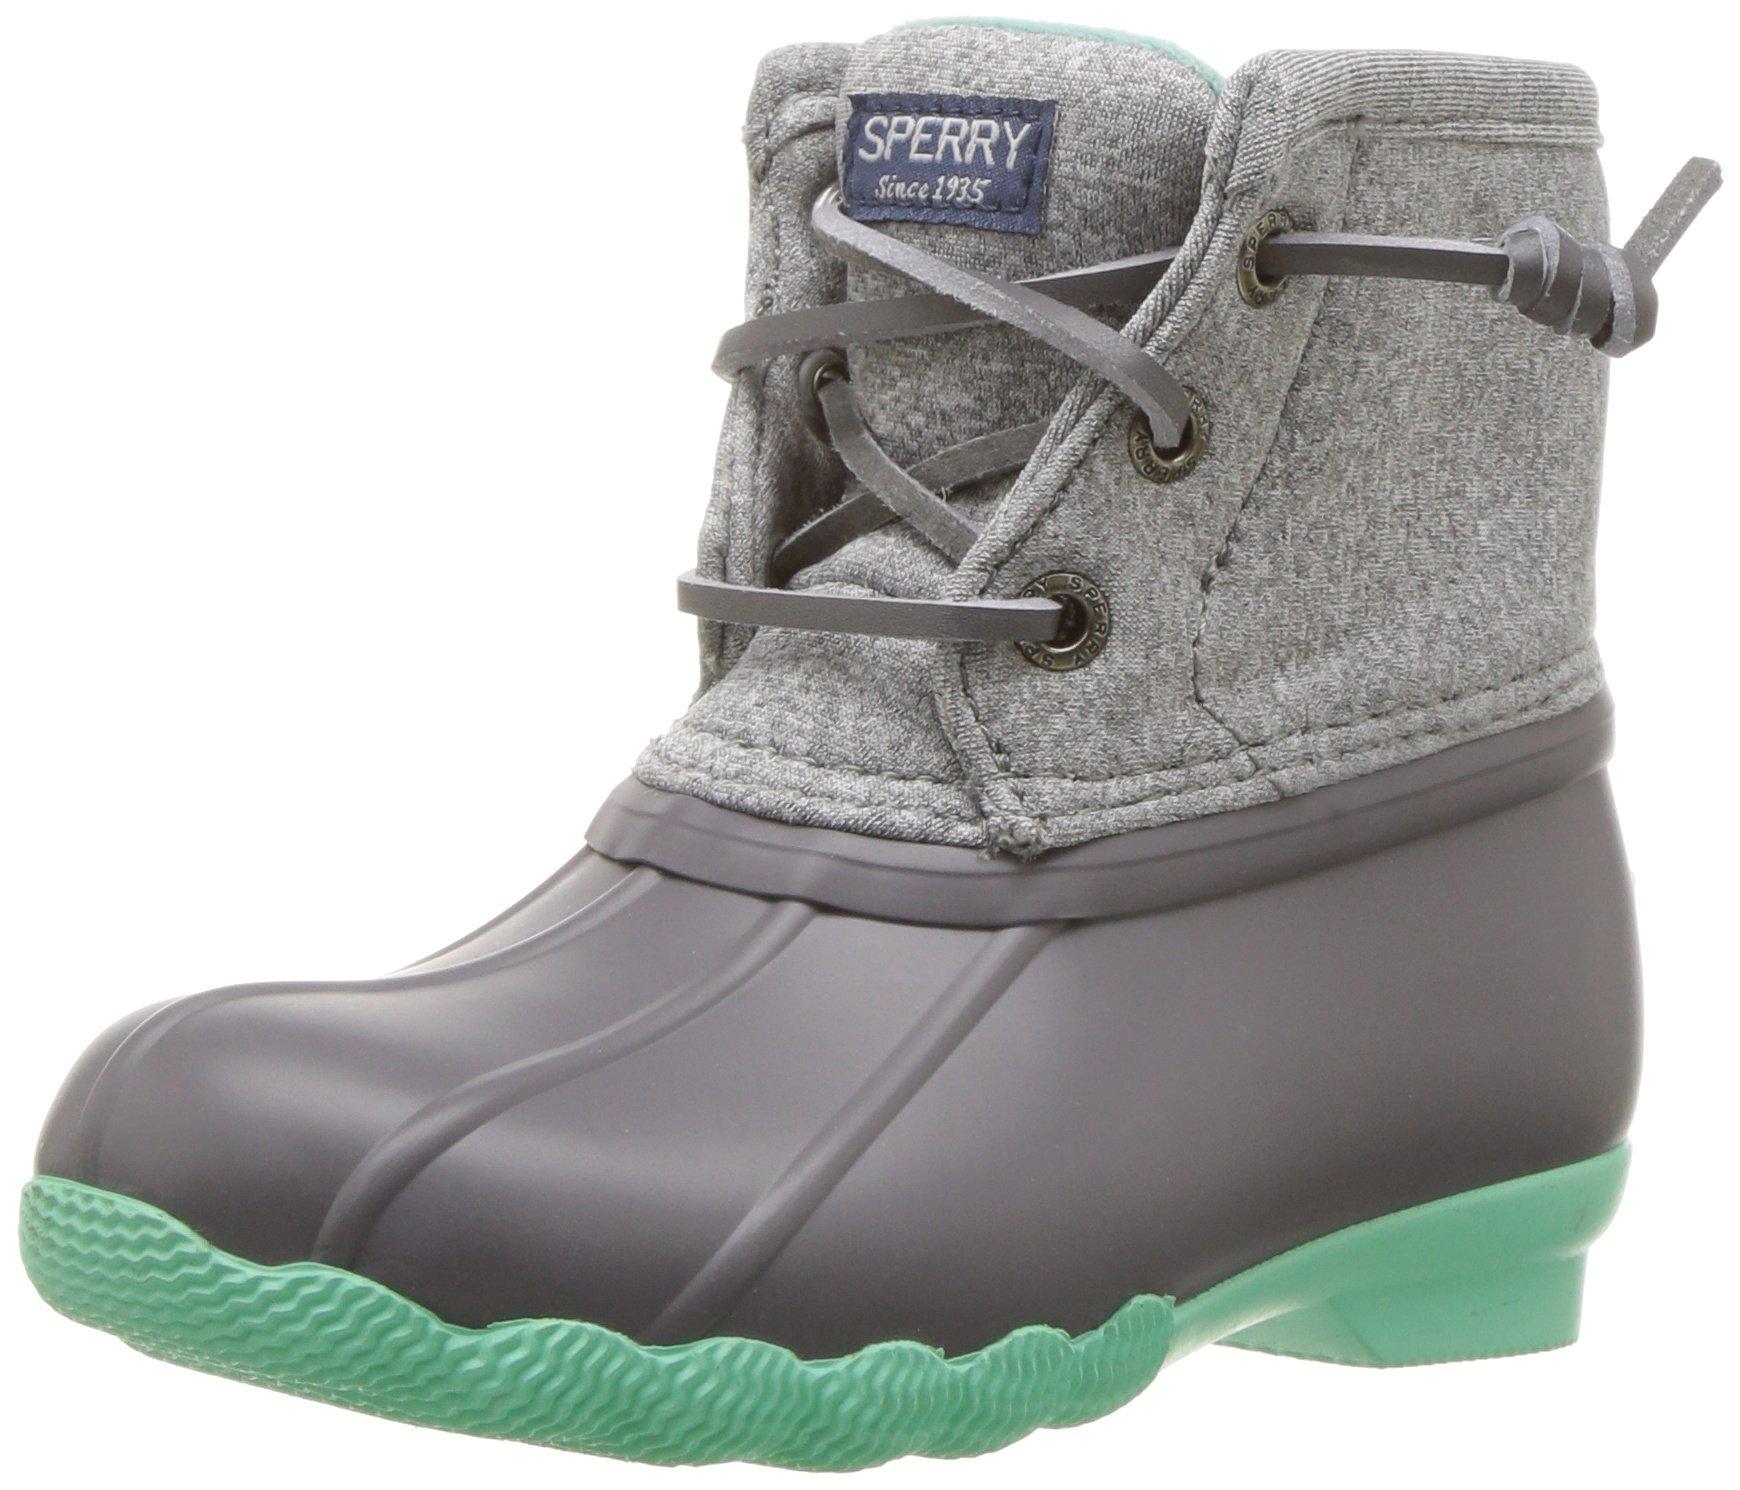 Sperry Girls' Saltwater Snow Boot, Grey/Mint, 11 Medium US Little Kid